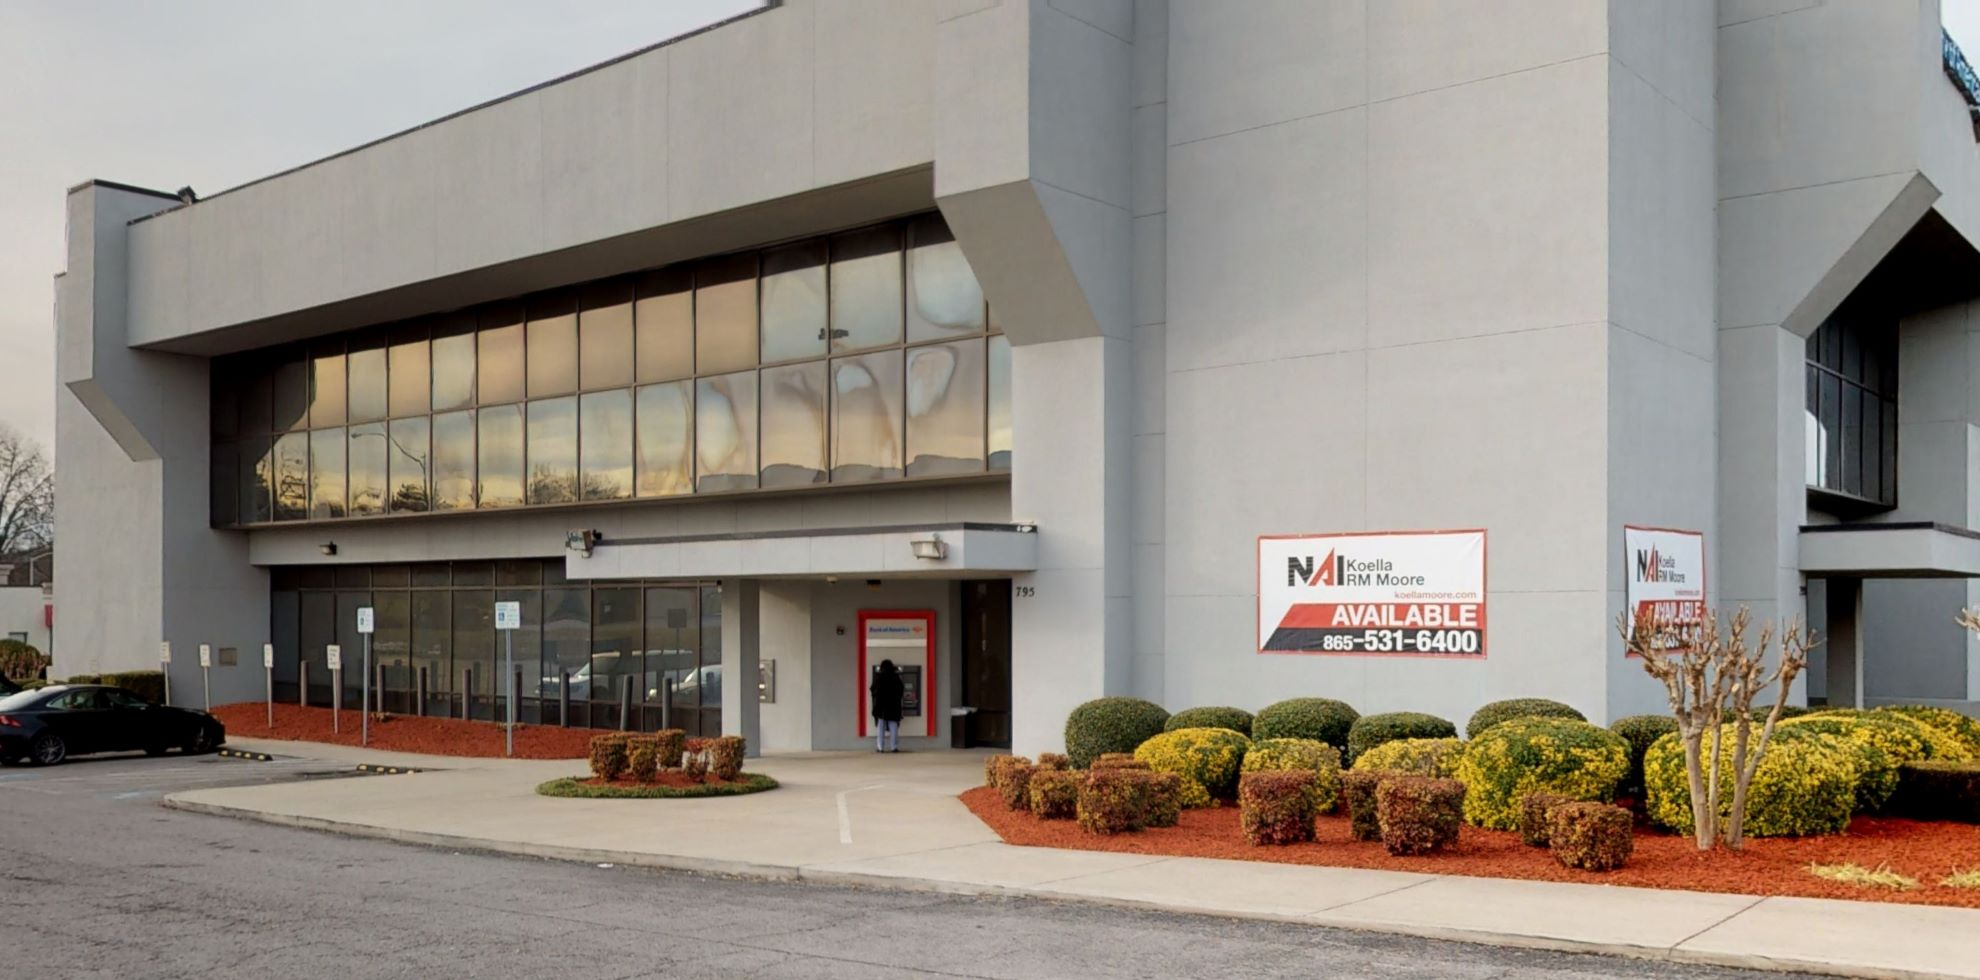 Bank of America financial center with walk-up ATM | 795 Main St W, Oak Ridge, TN 37830